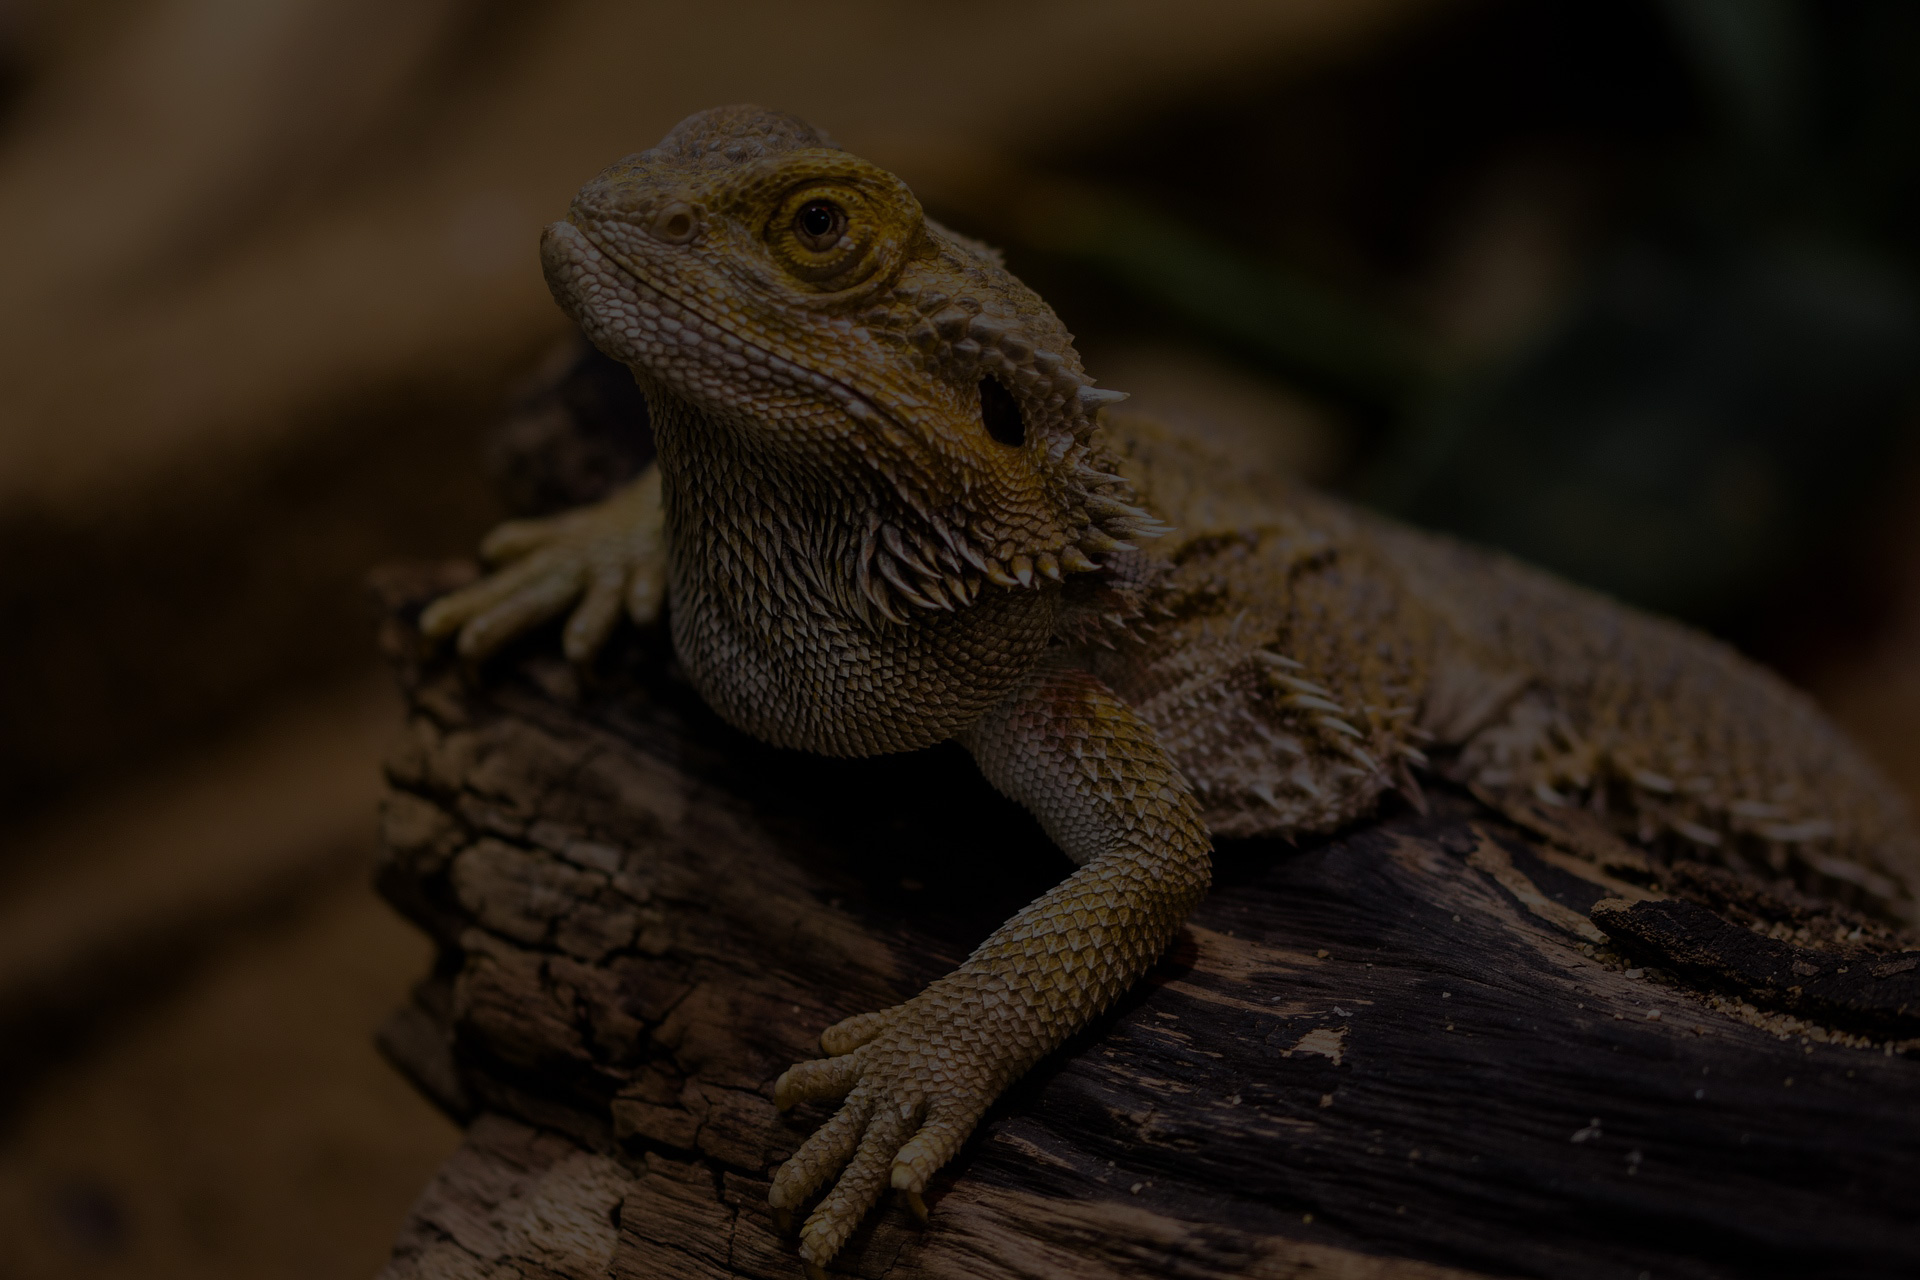 lizard-agame-reptile-amphibian